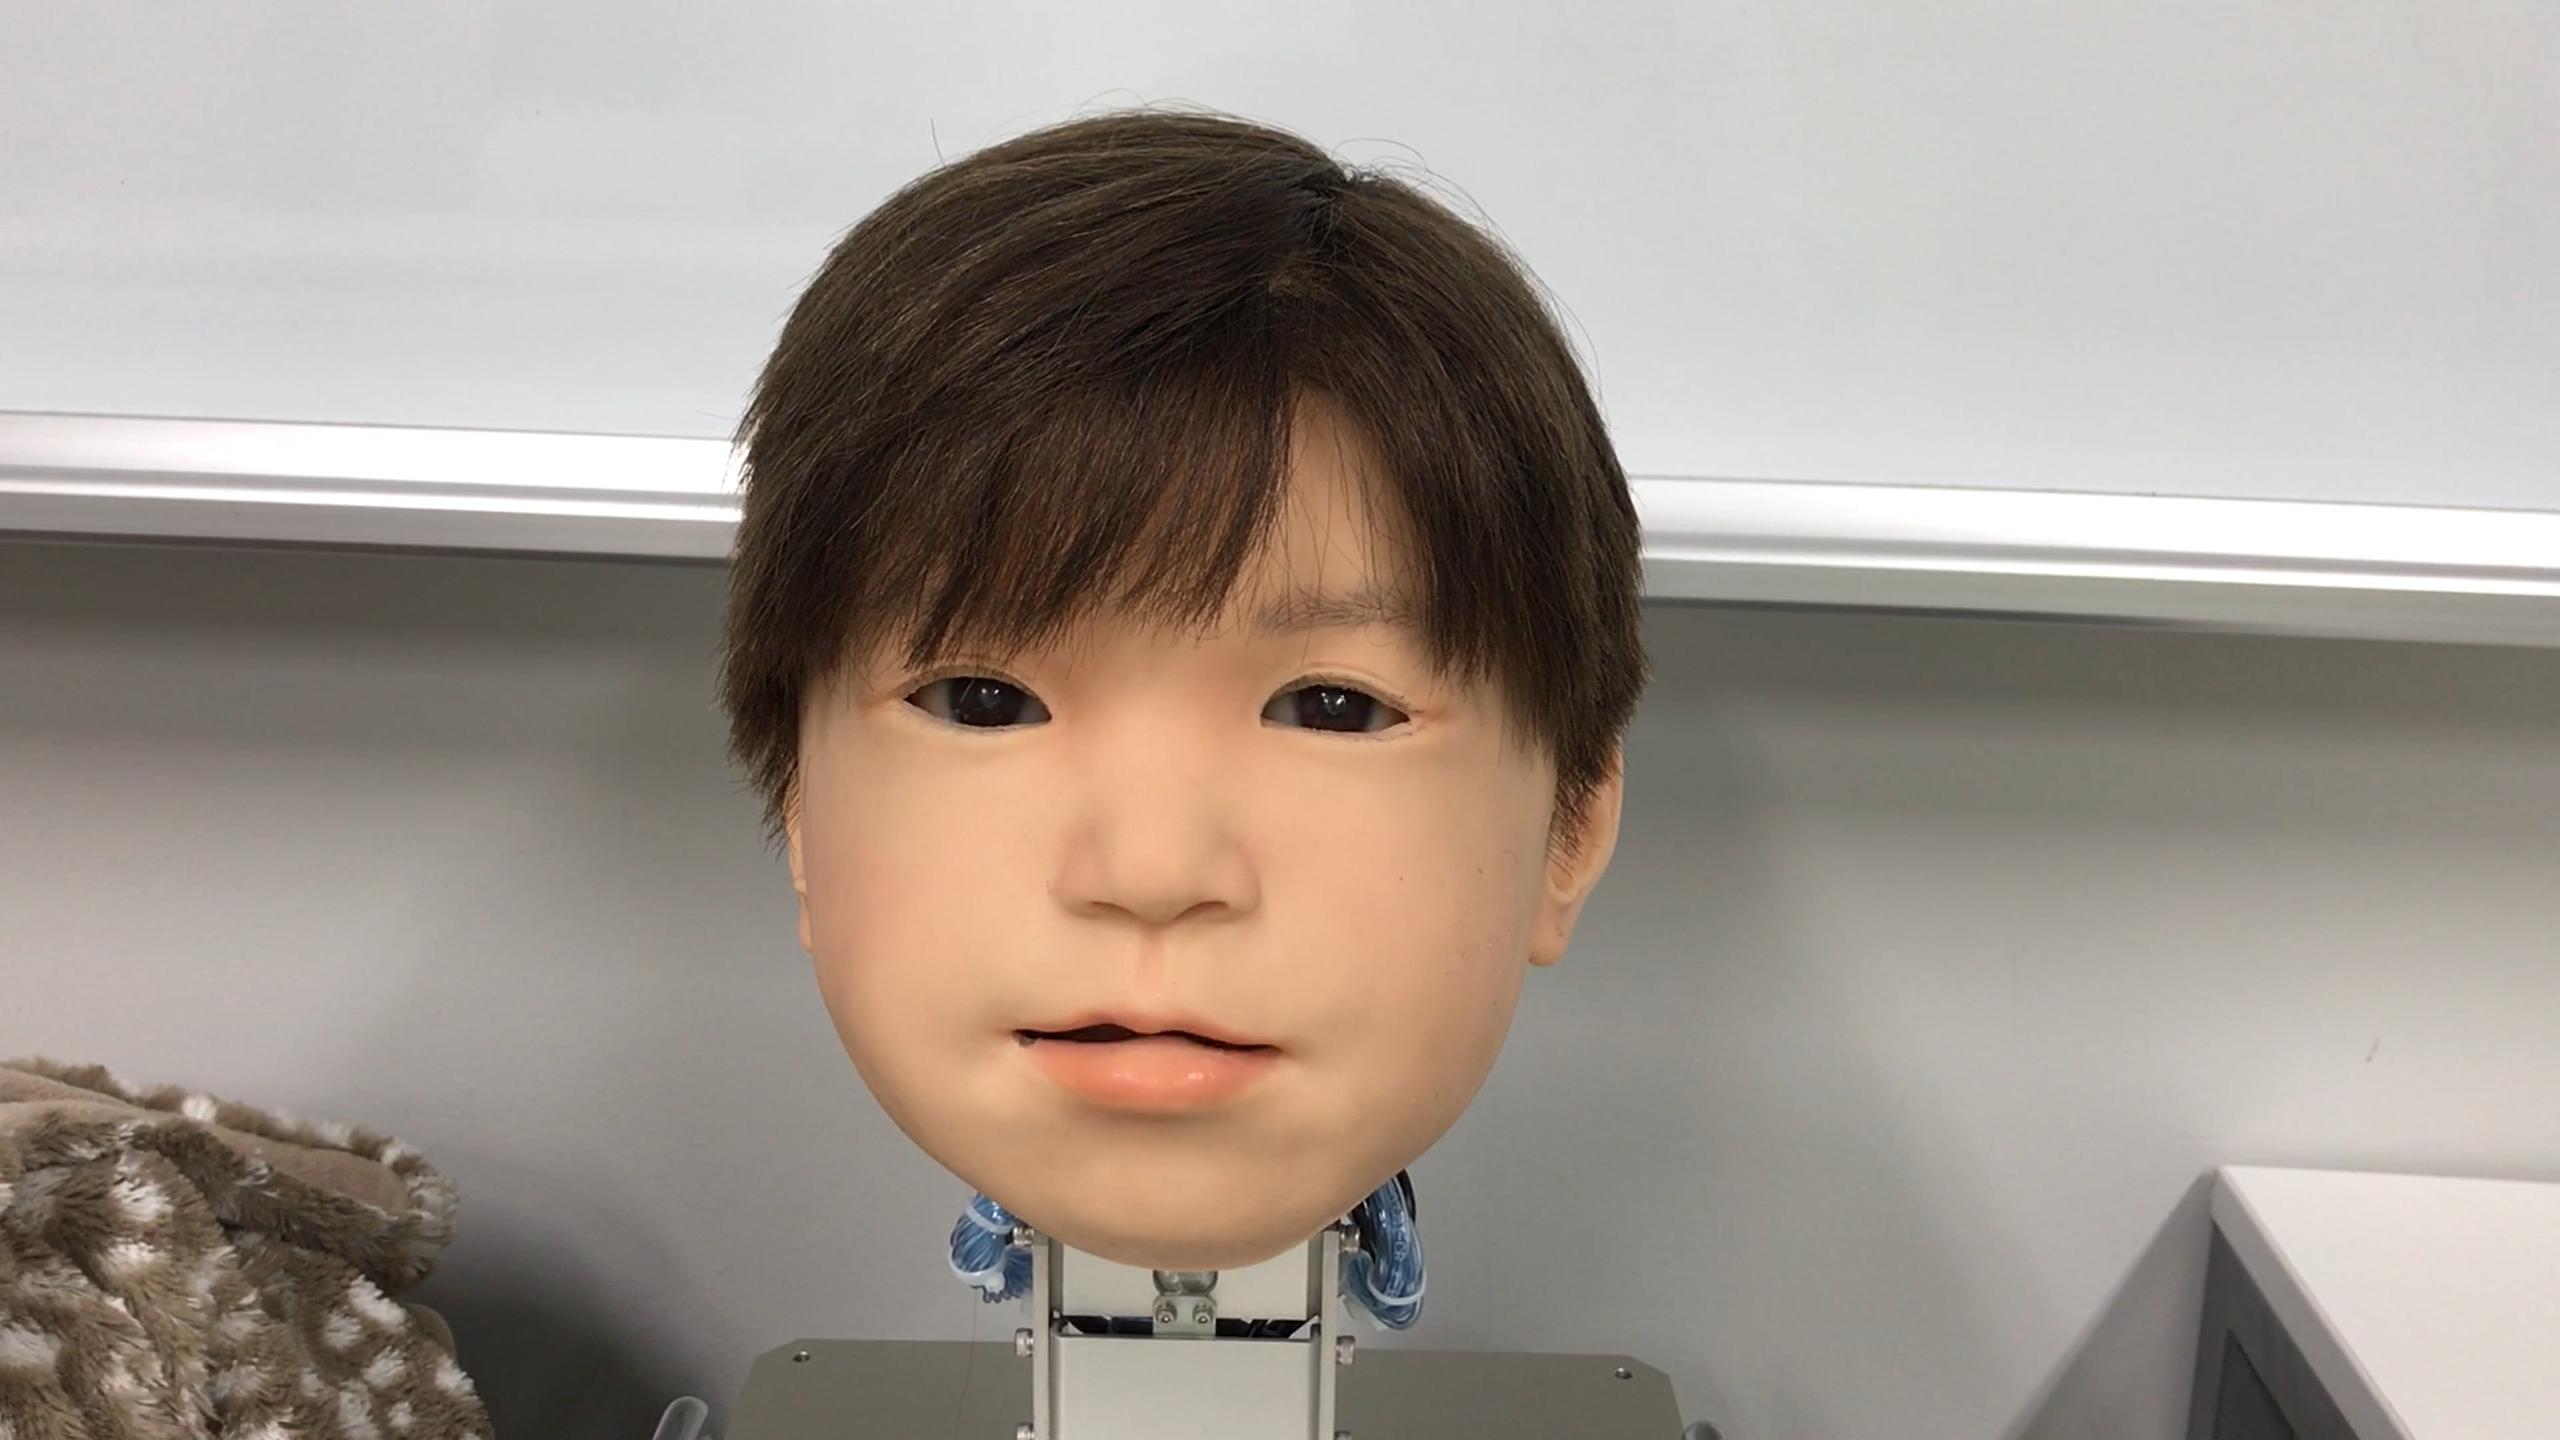 affetto-gyerekarcu-android-noko-01.png